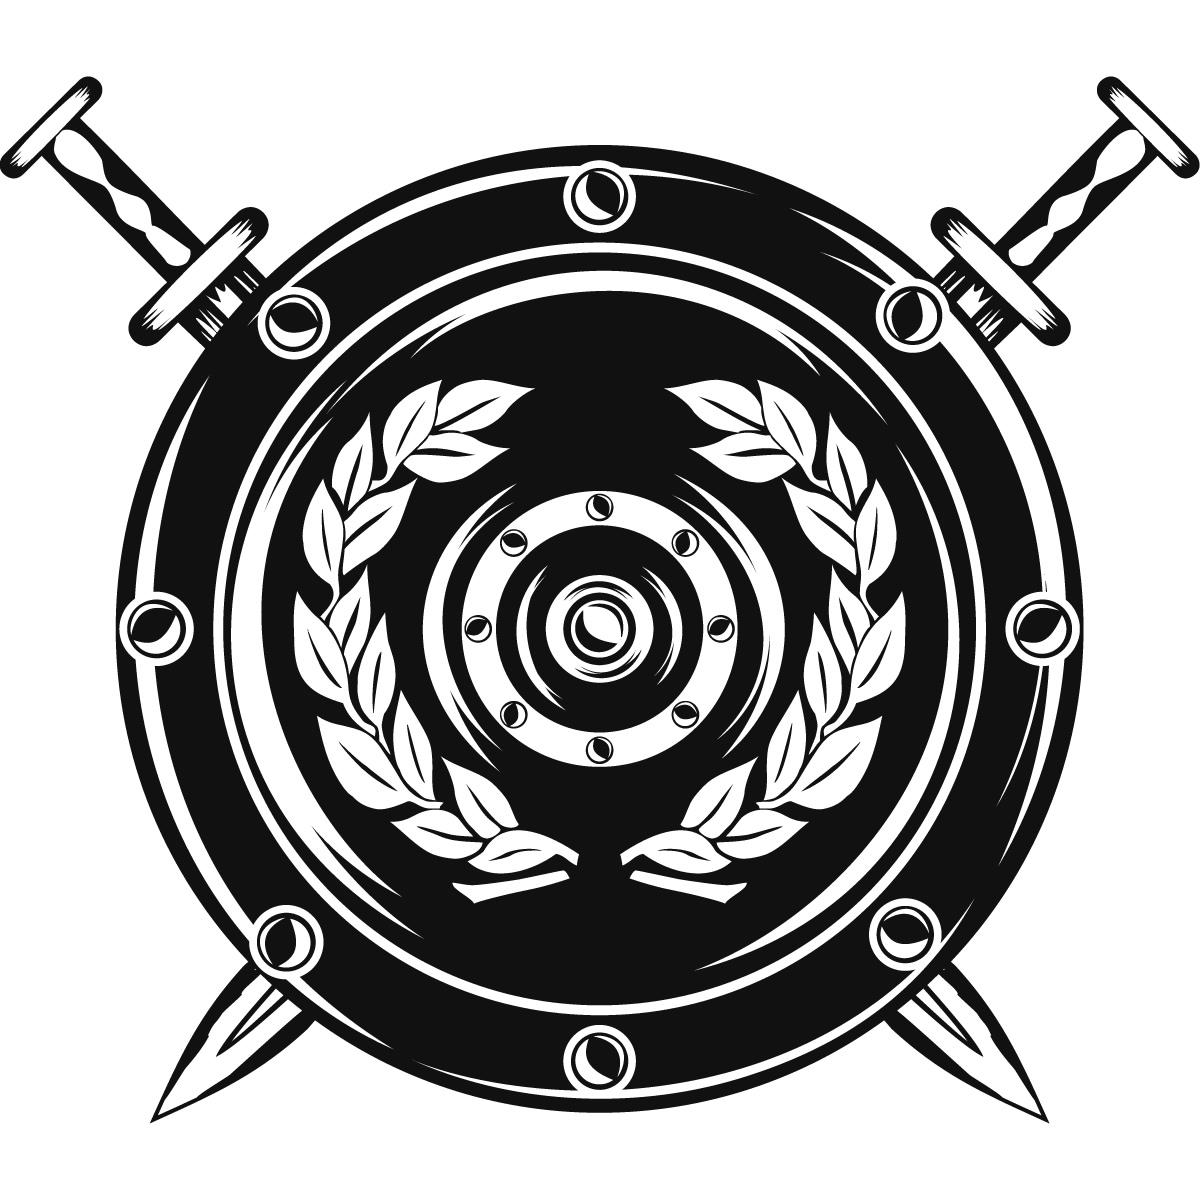 Knight Emblem Freak The Mighty